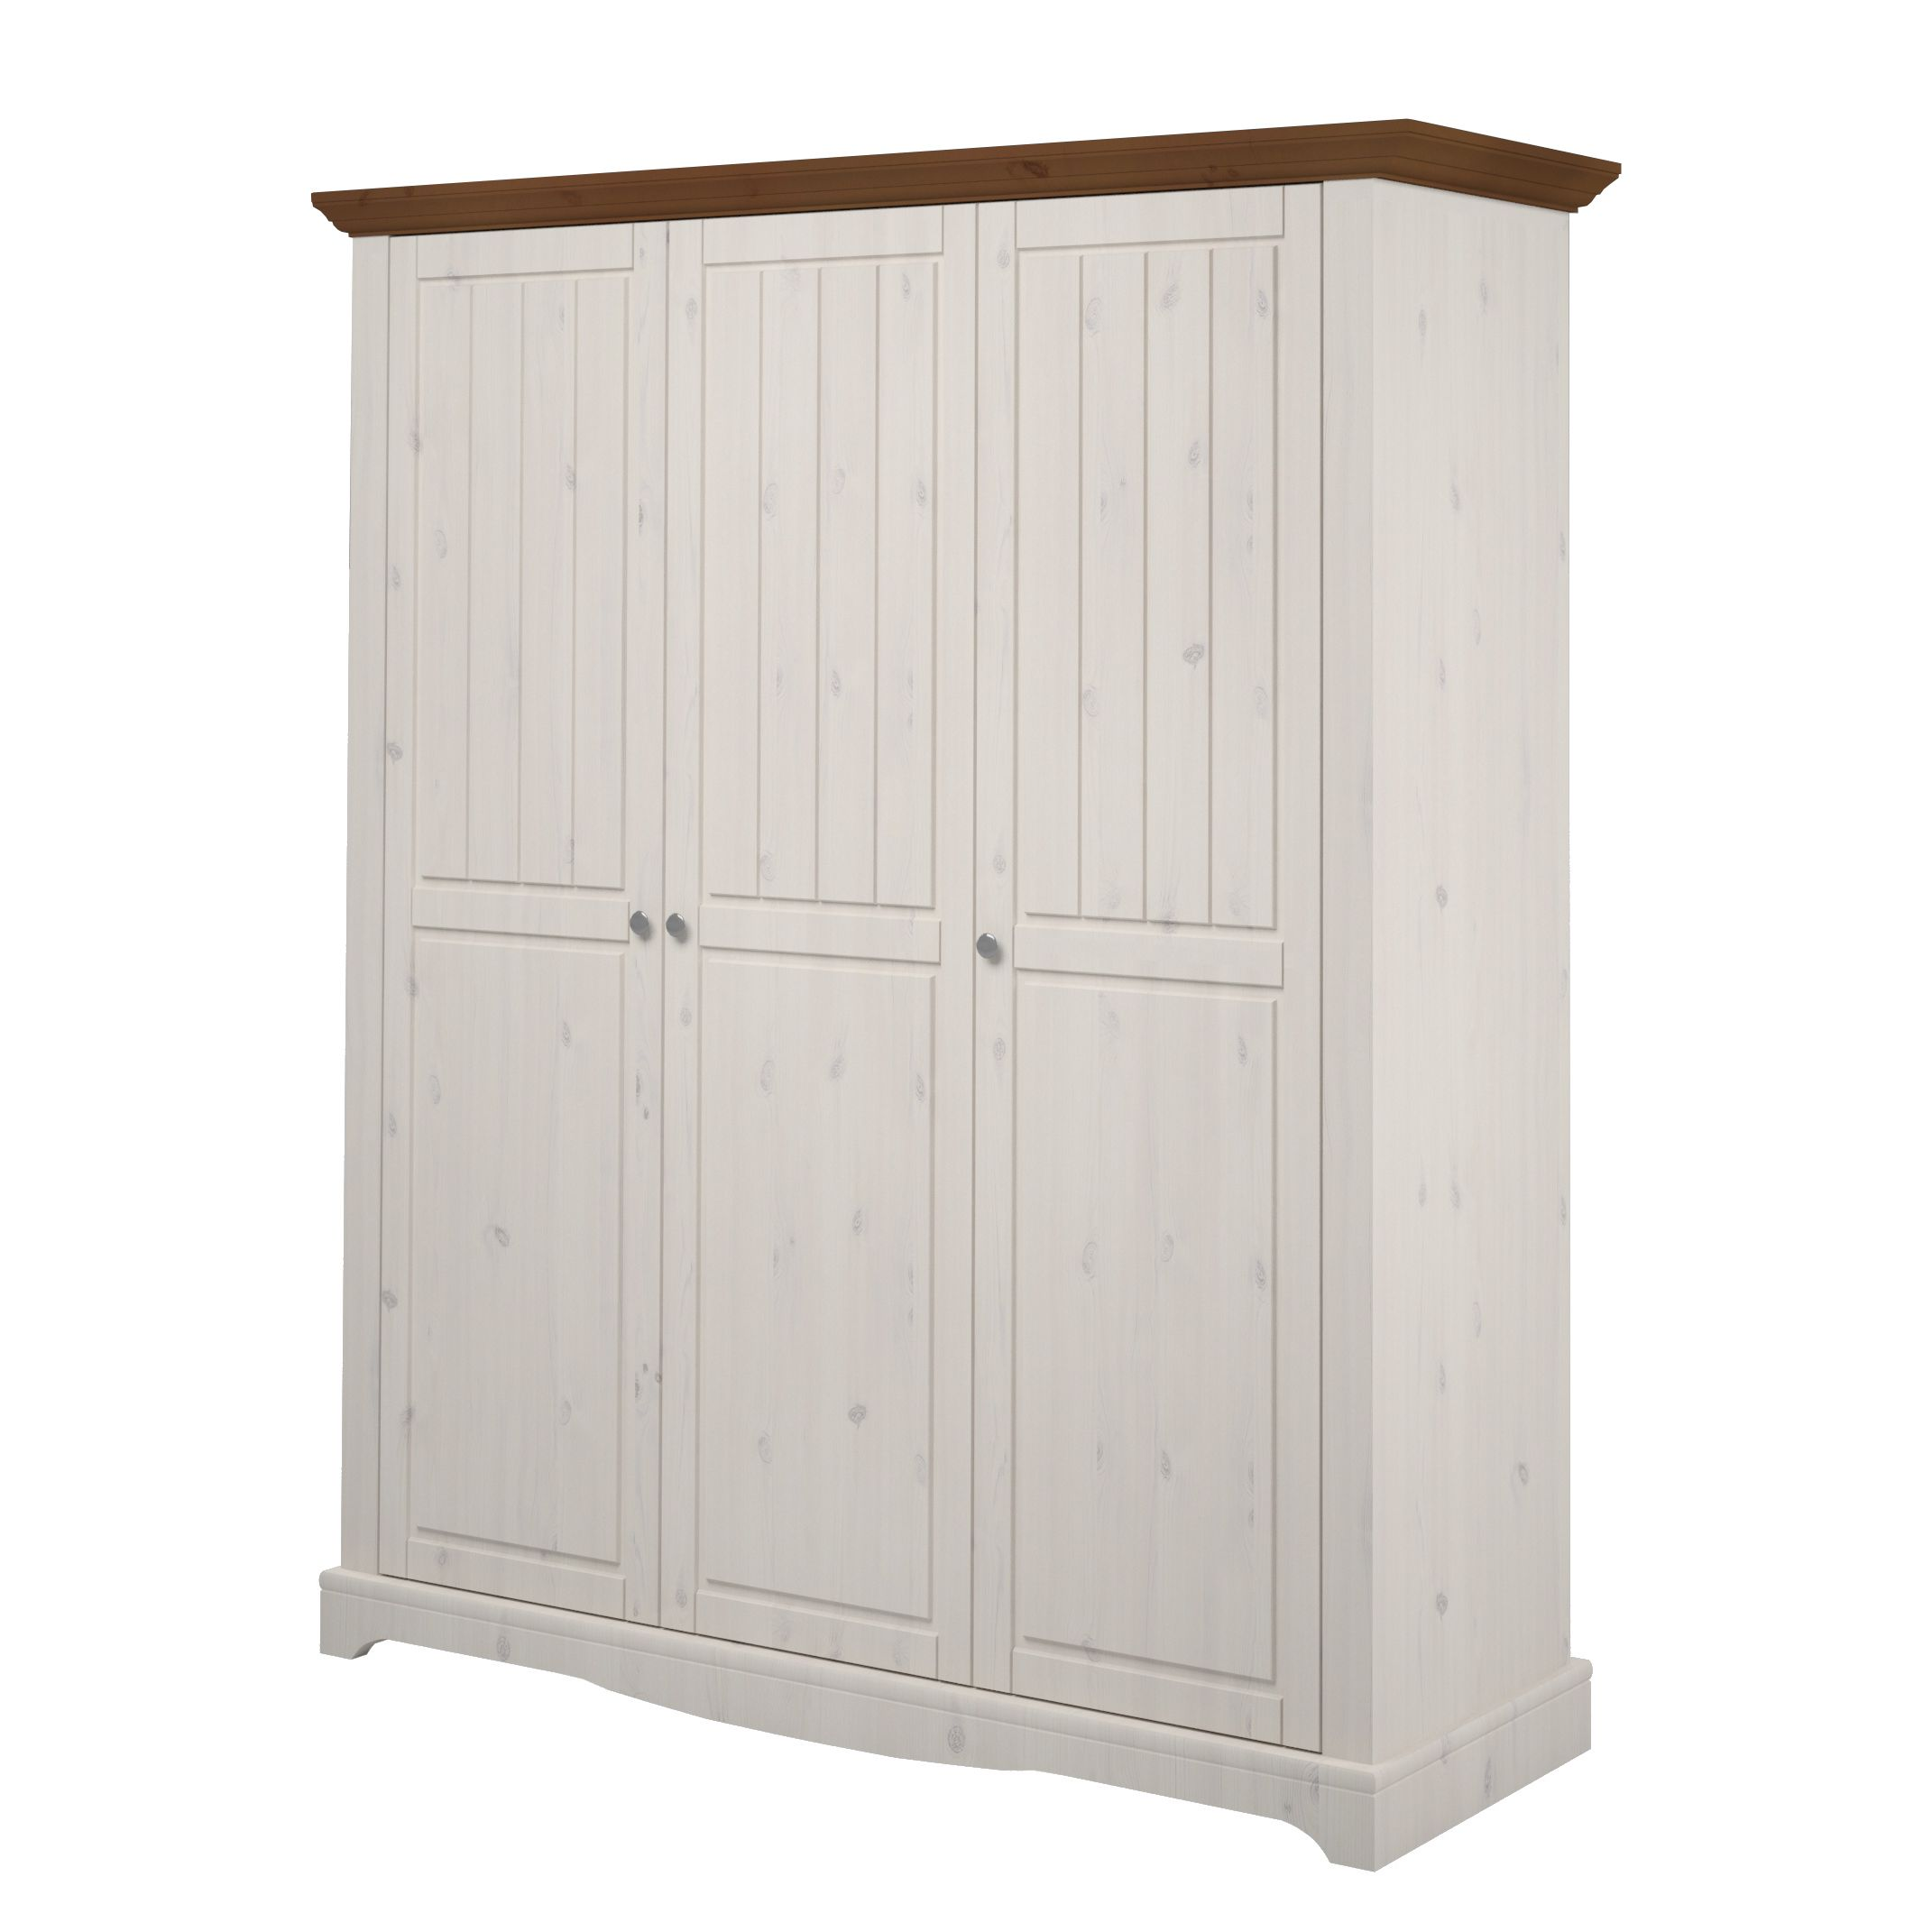 Armoire à vêtements Karlotta (3 portes) - Pin / Blanc lavé - White Washed / Provence, Steens